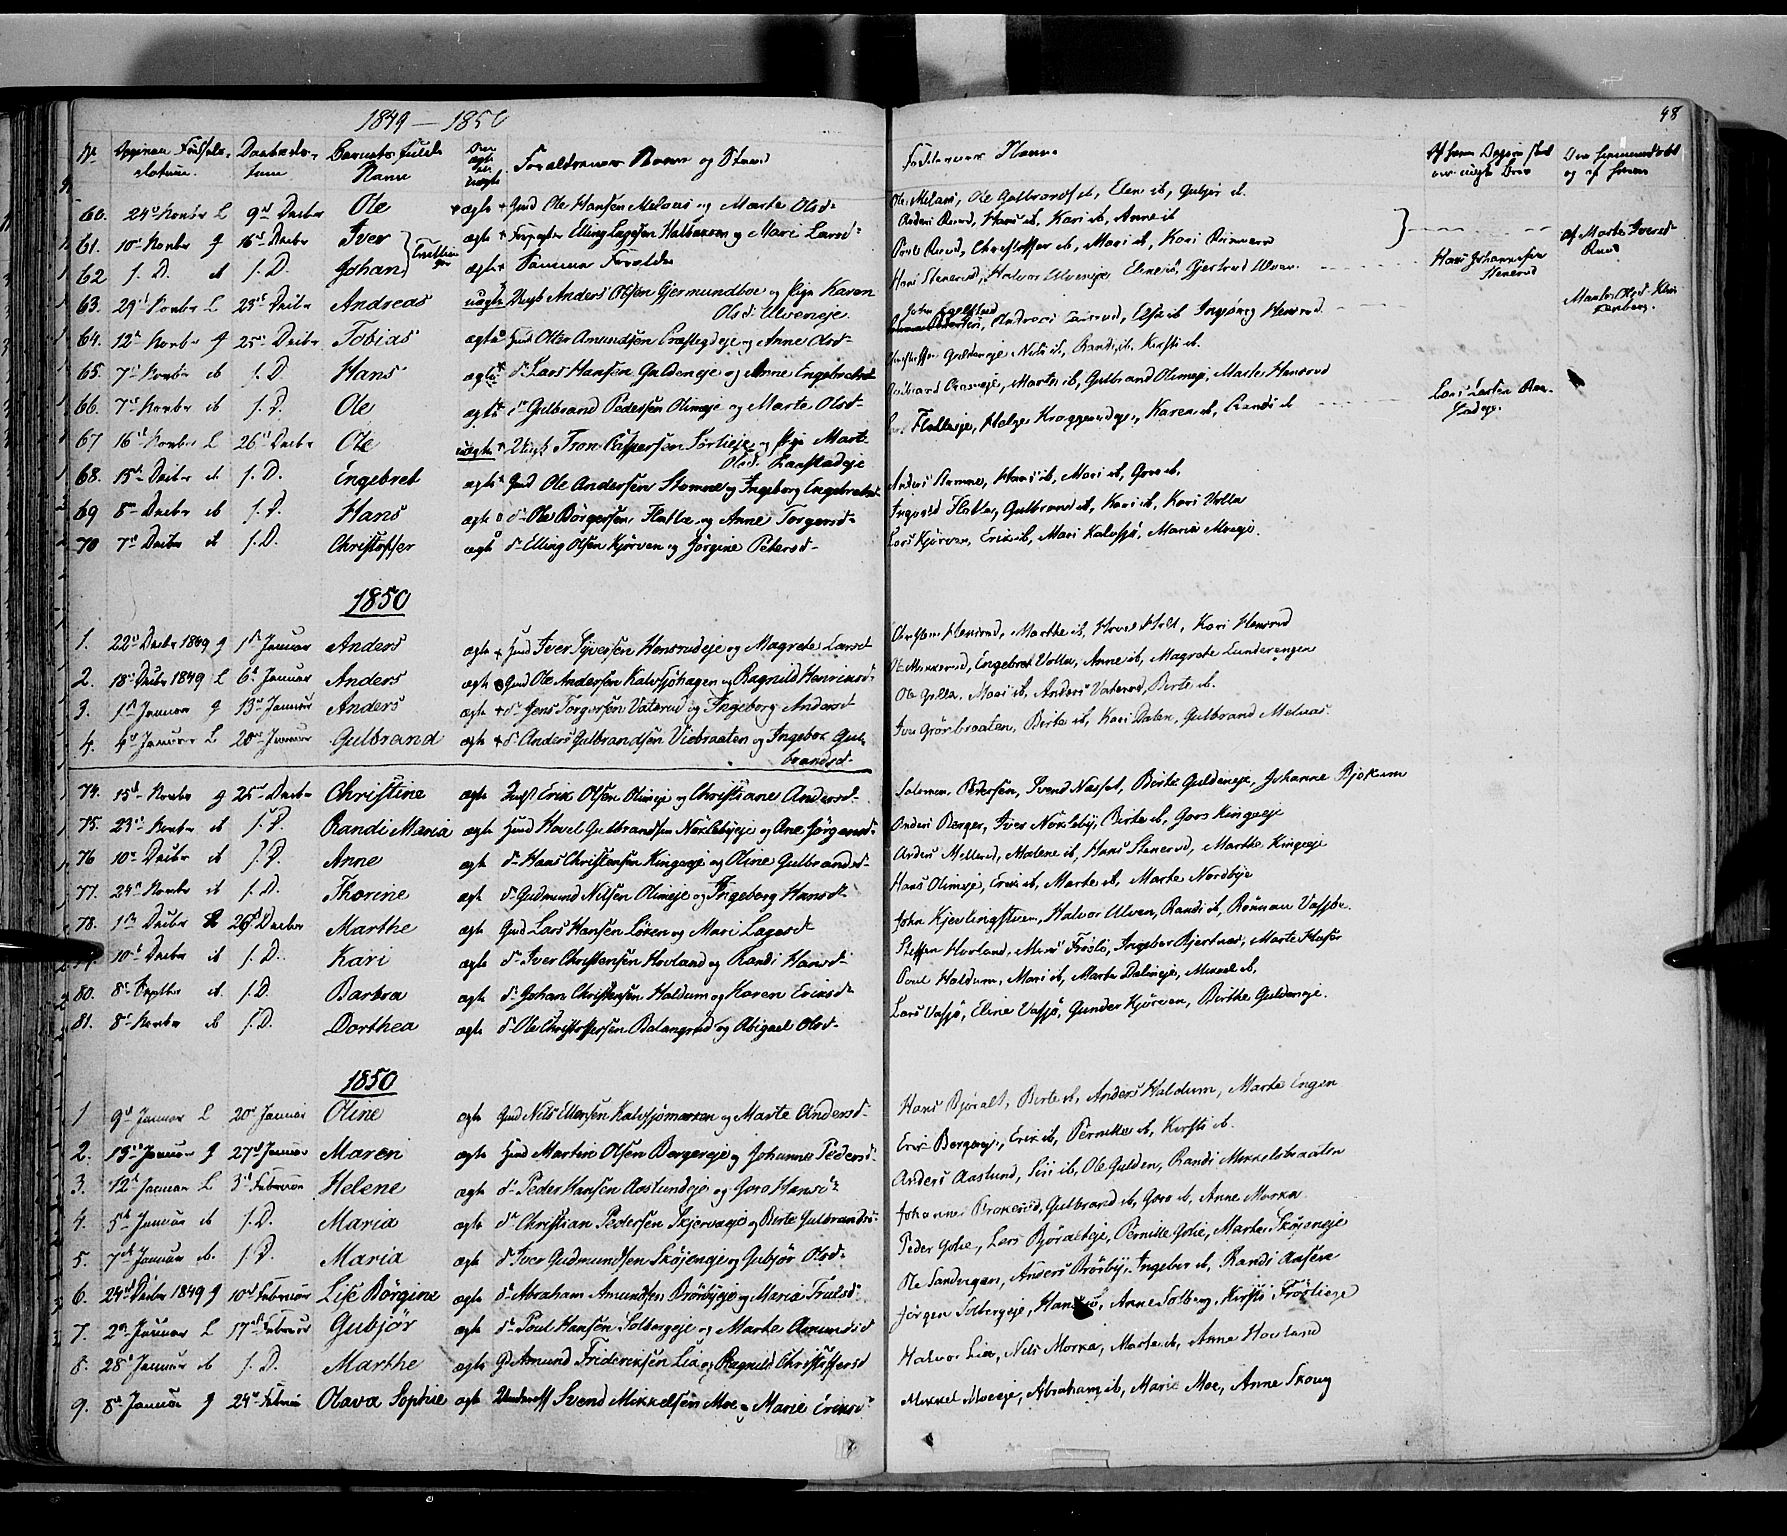 SAH, Jevnaker prestekontor, Ministerialbok nr. 6, 1837-1857, s. 48